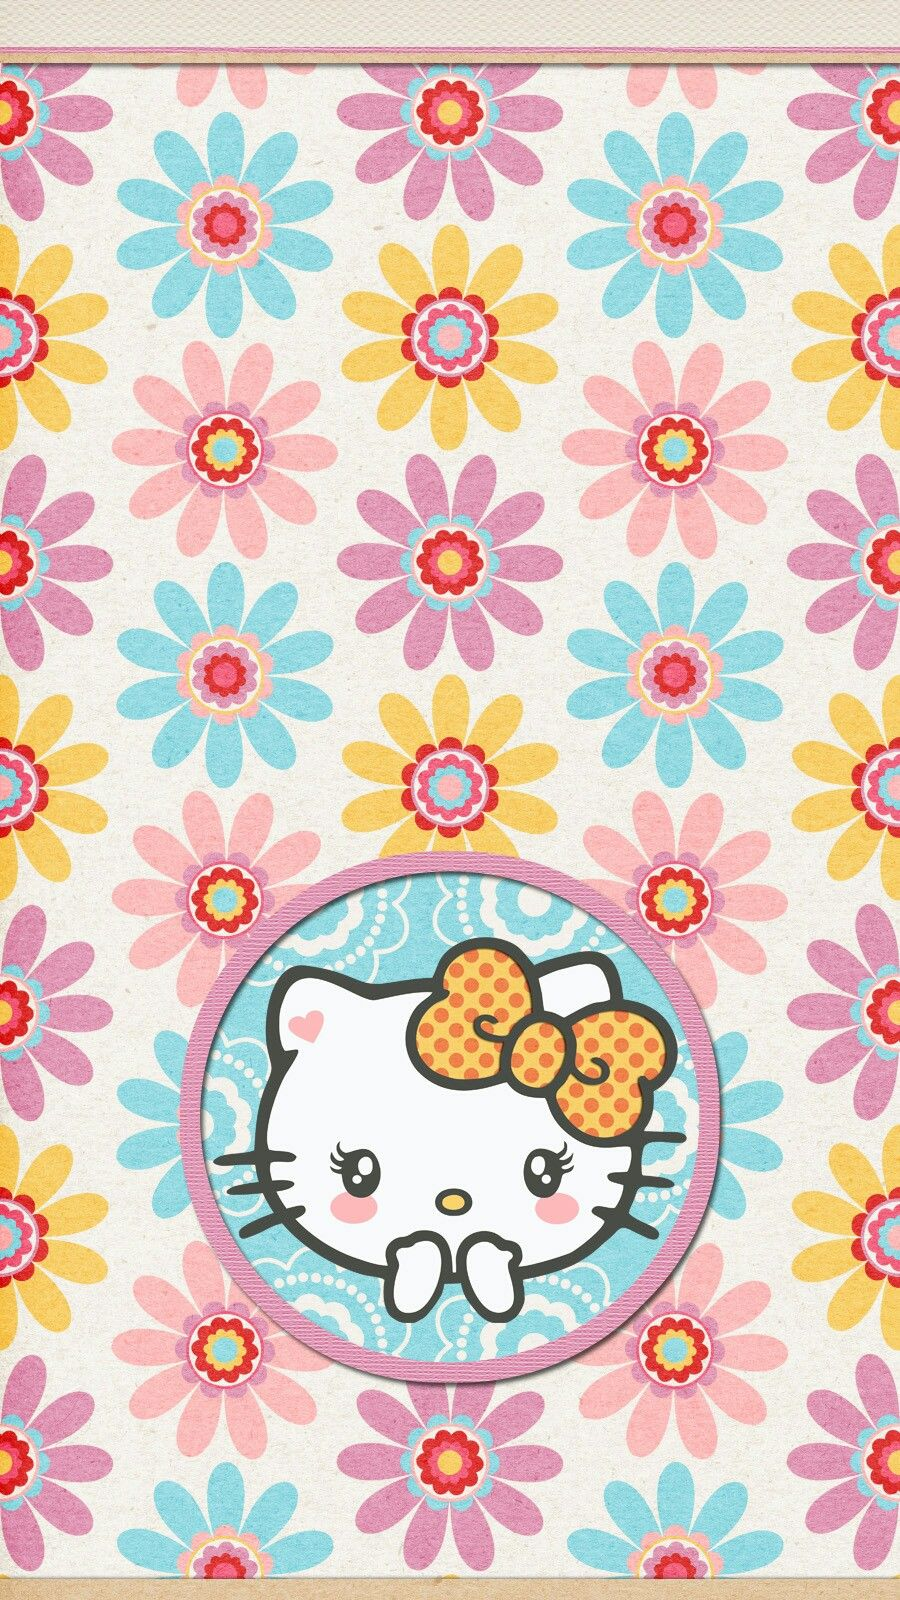 Popular Wallpaper Hello Kitty Smartphone - a0528254d15095cf554e3eb79843b147  Pic_95563.jpg